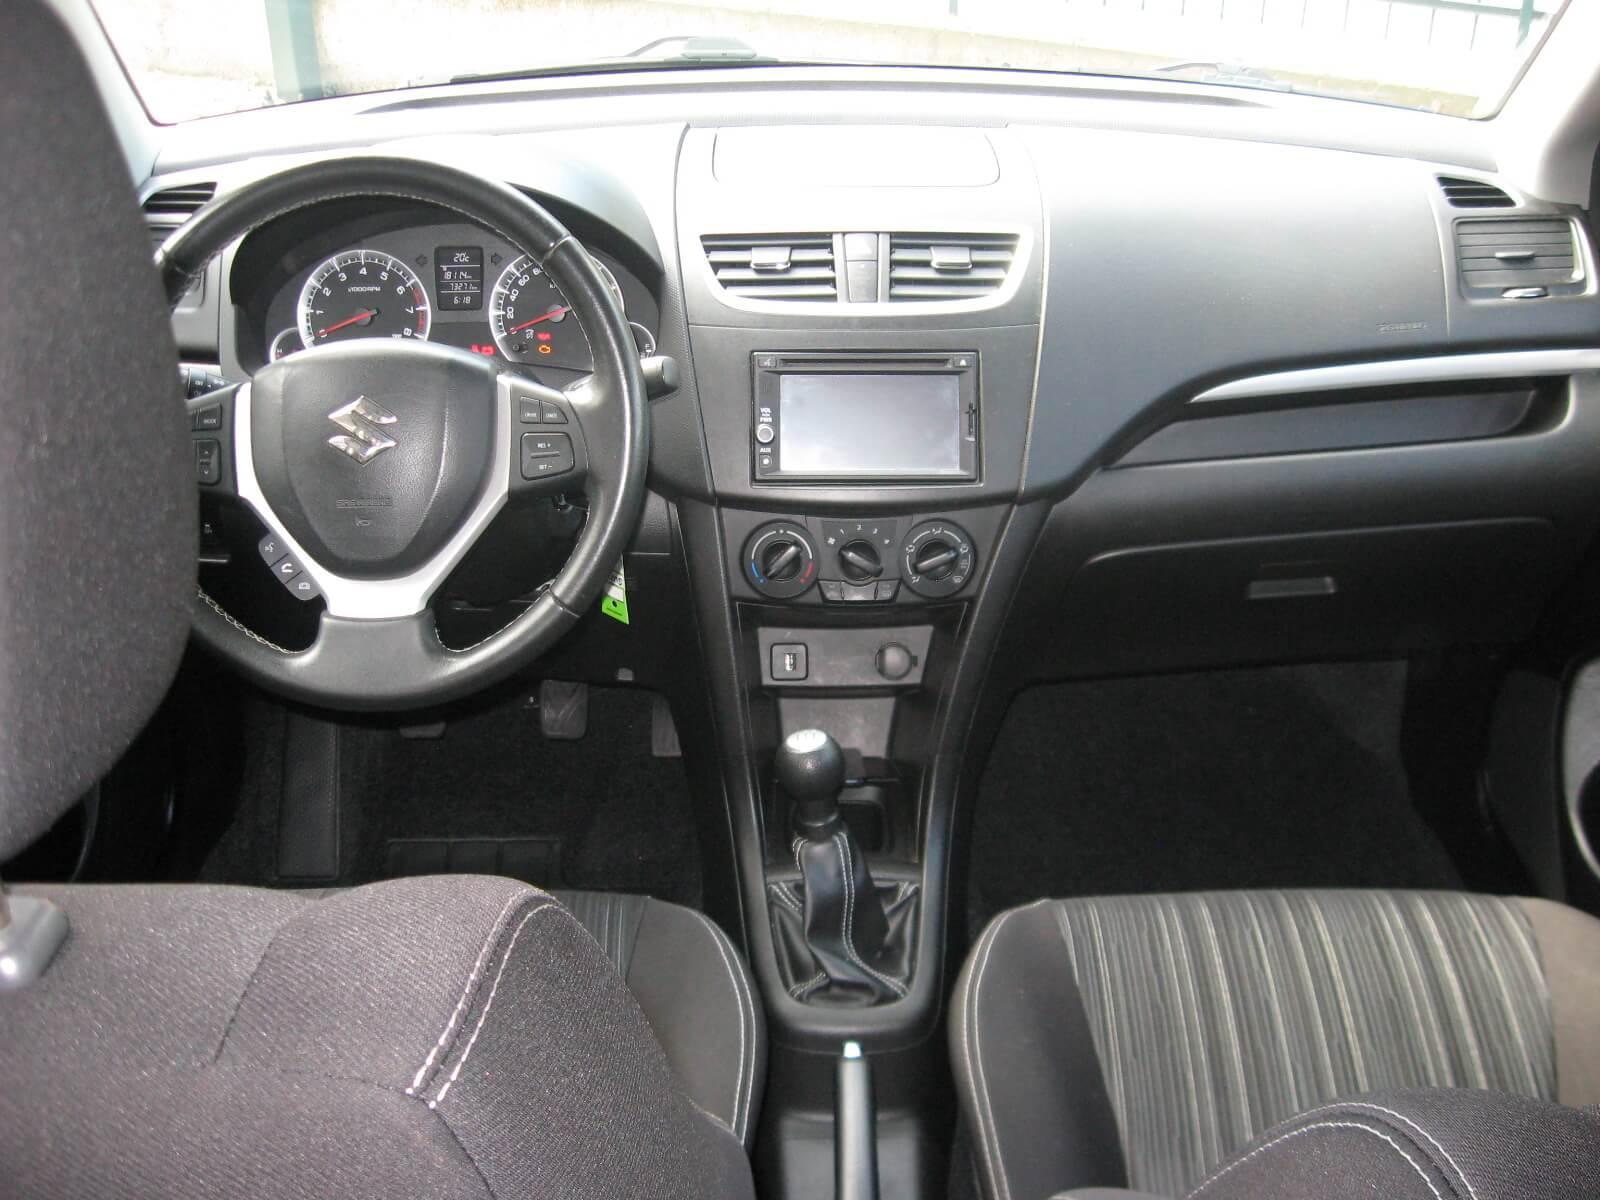 Suzuki Swift 1.2 VVT 5 porte B-Cool Bi-Color